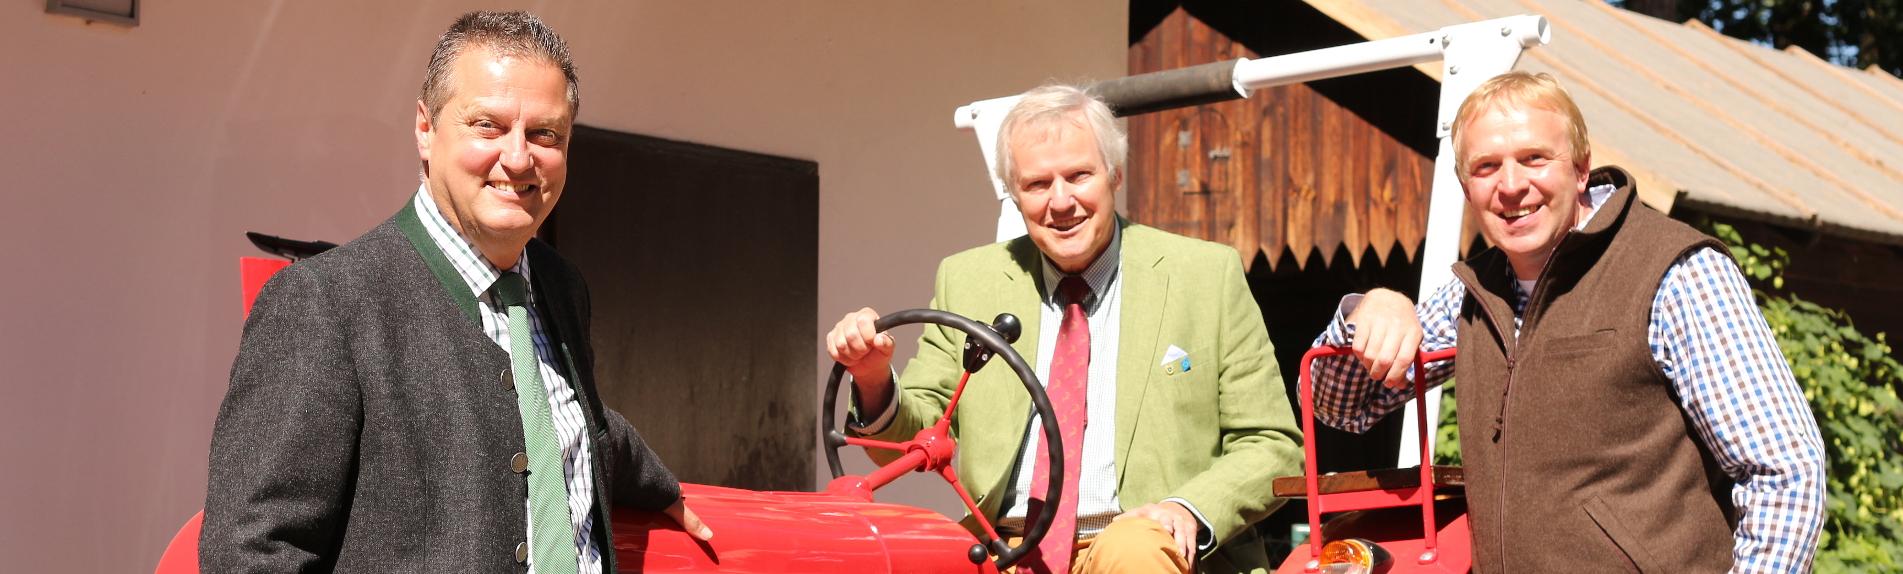 Titelbanner-Traktor-Neumeyer-Vocke